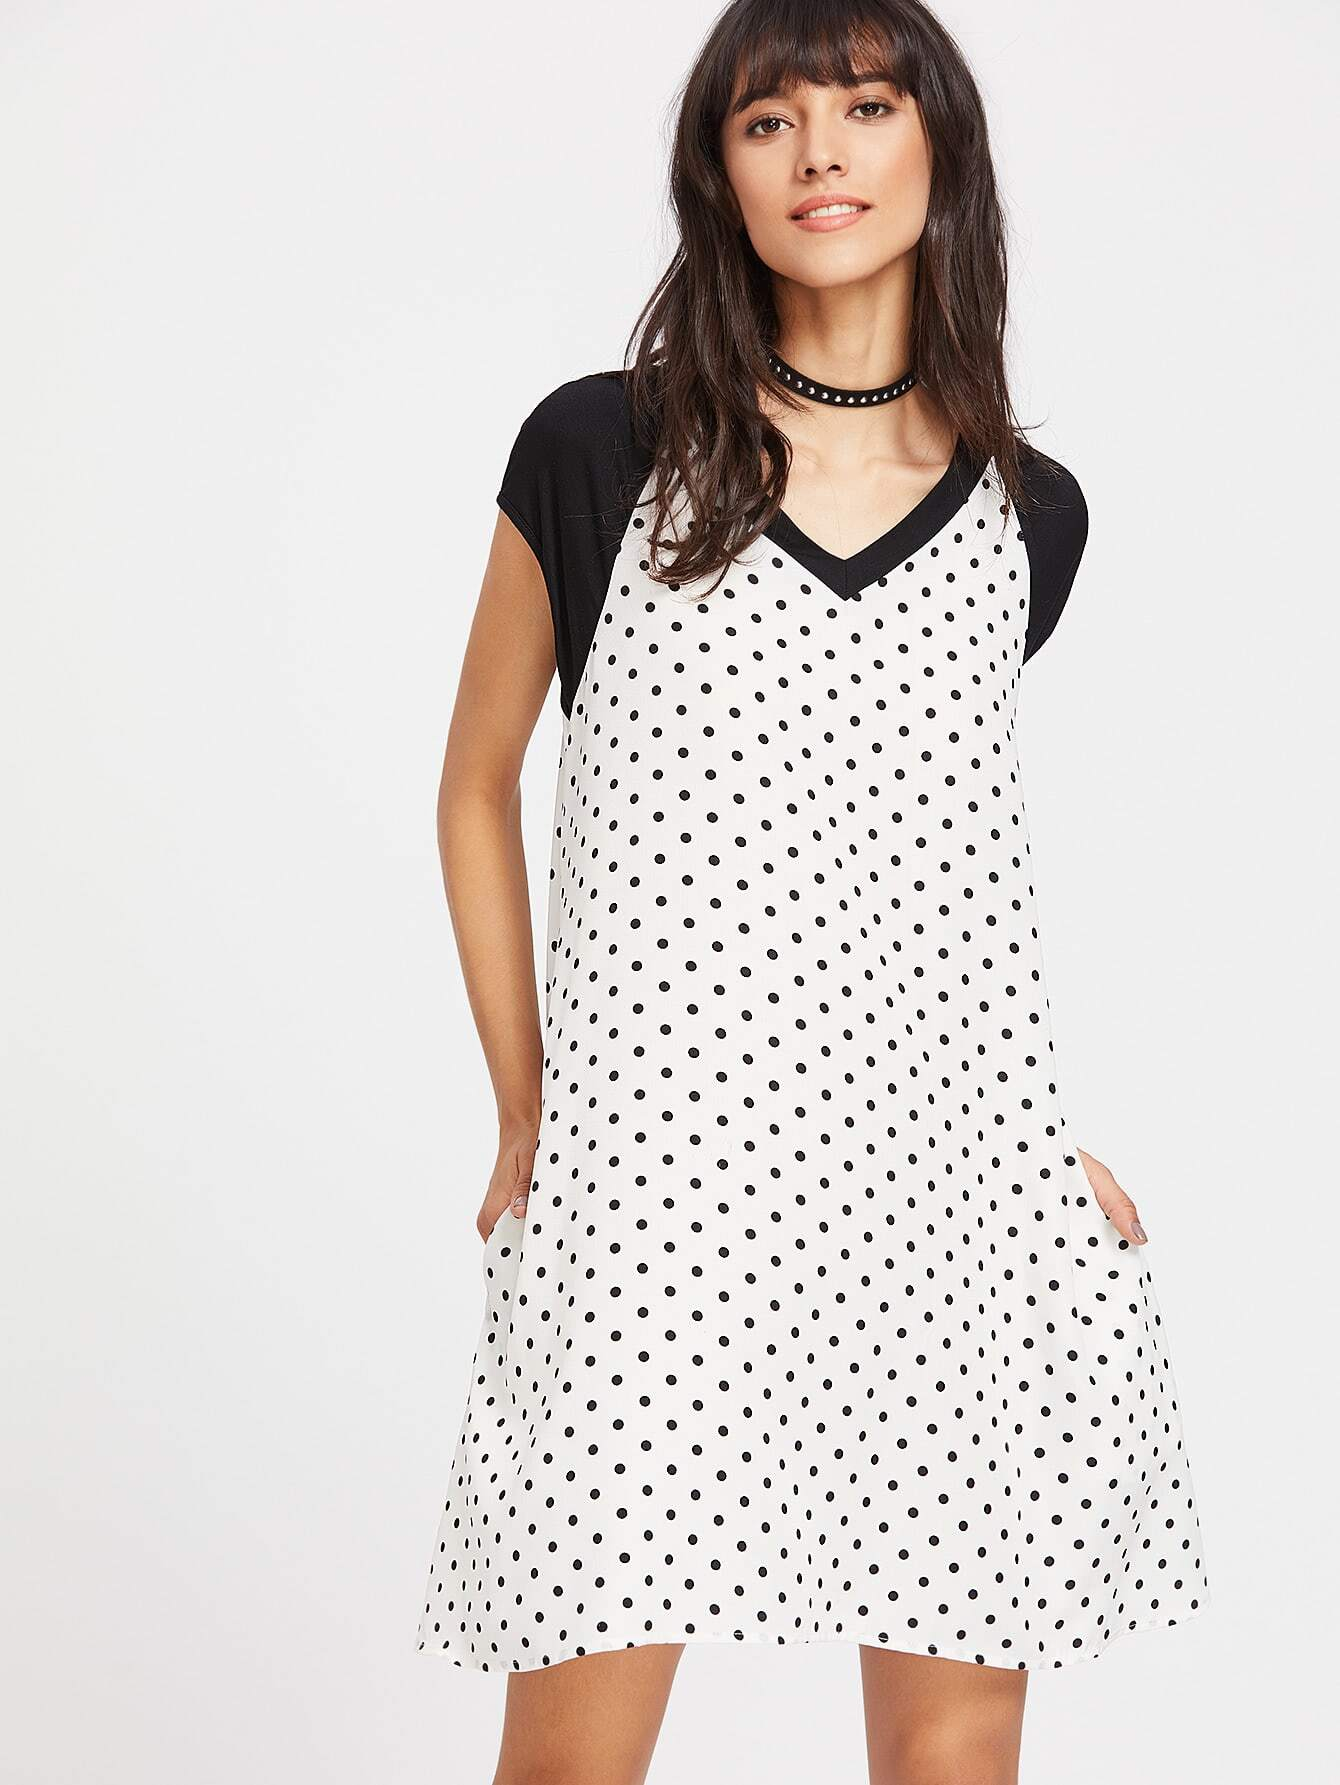 Polka Dot Print Raglan Sleeves  Dress